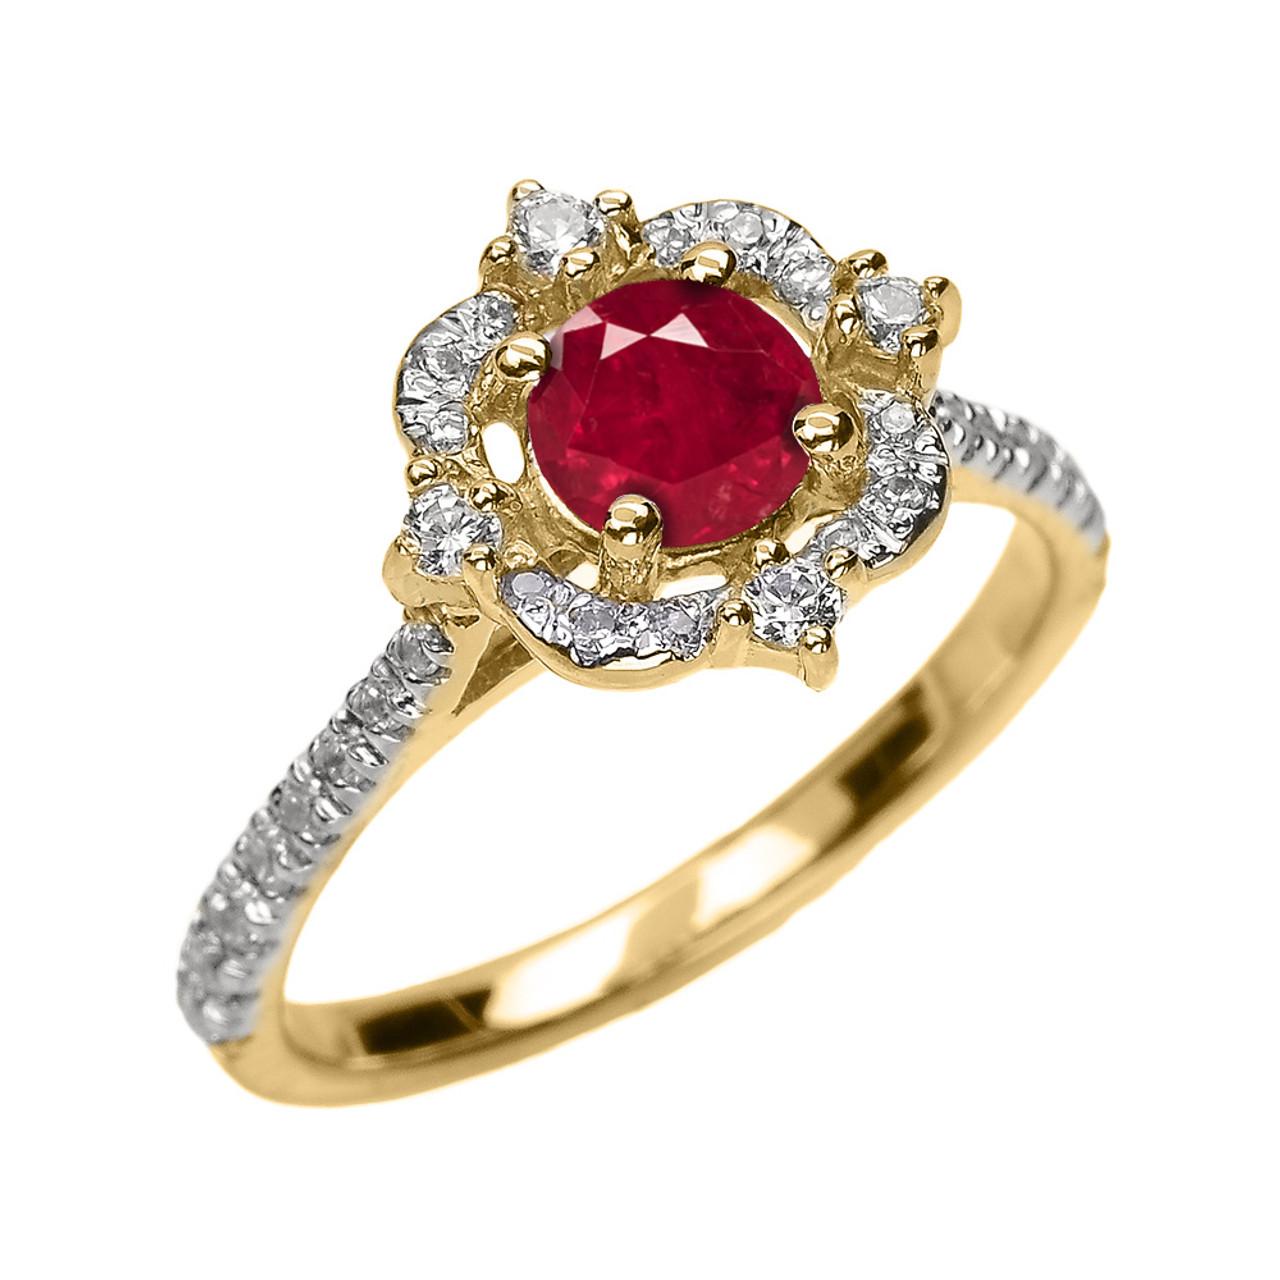 2 Band Diamond Wedding Engagement Proposal Set Ring: Yellow Gold Genuine Ruby And Diamond Dainty Engagement